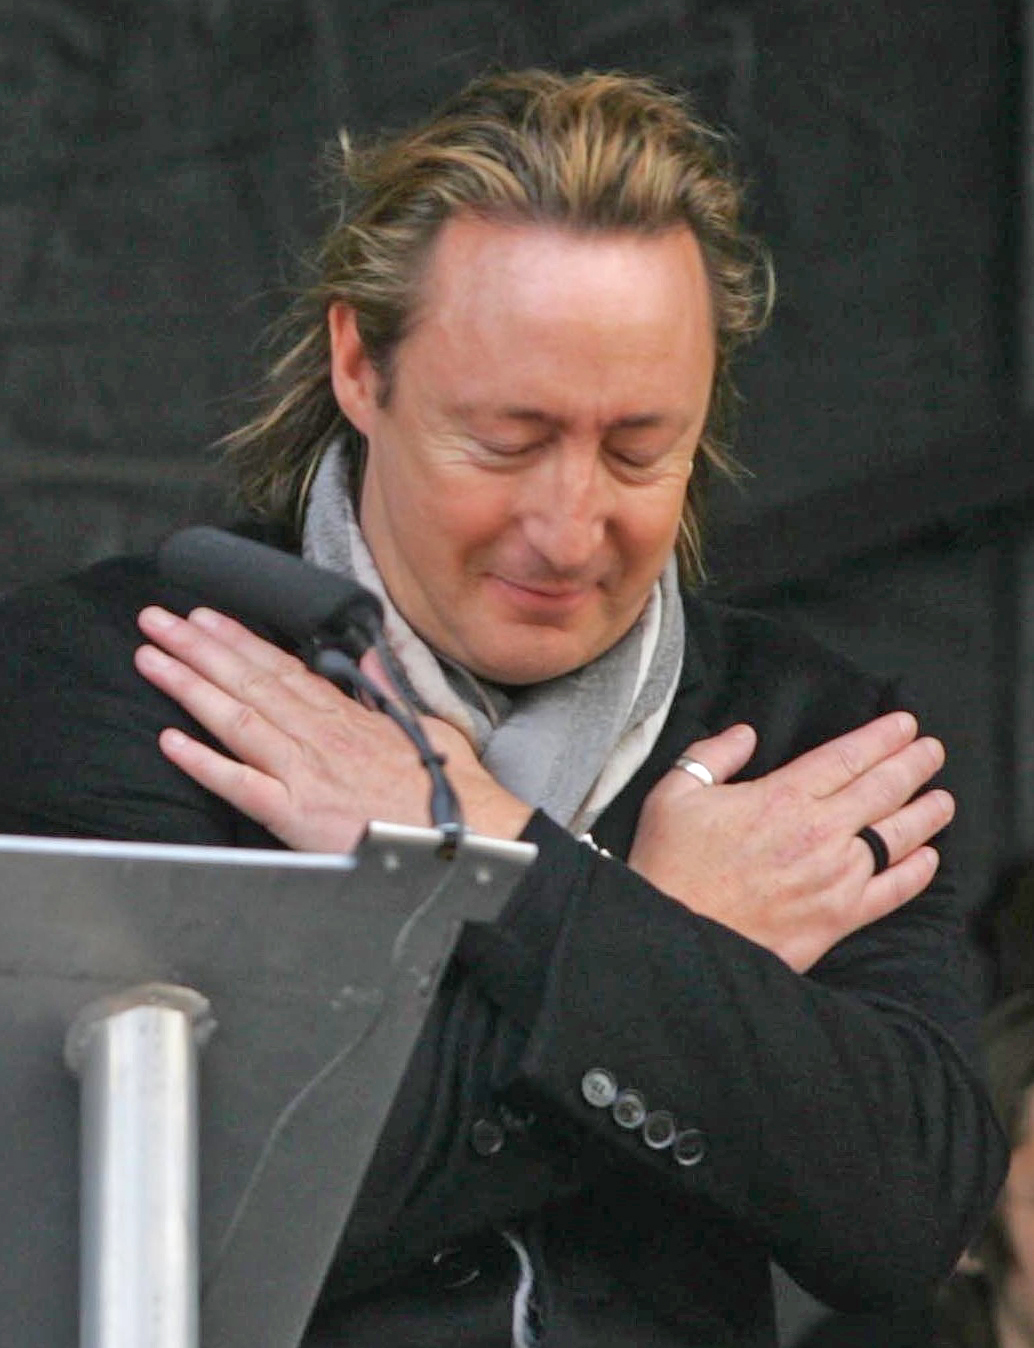 Julian Lennon durante la inauguración del Monumento John Lennon a la paz en Liverpool, octubre de 2010.